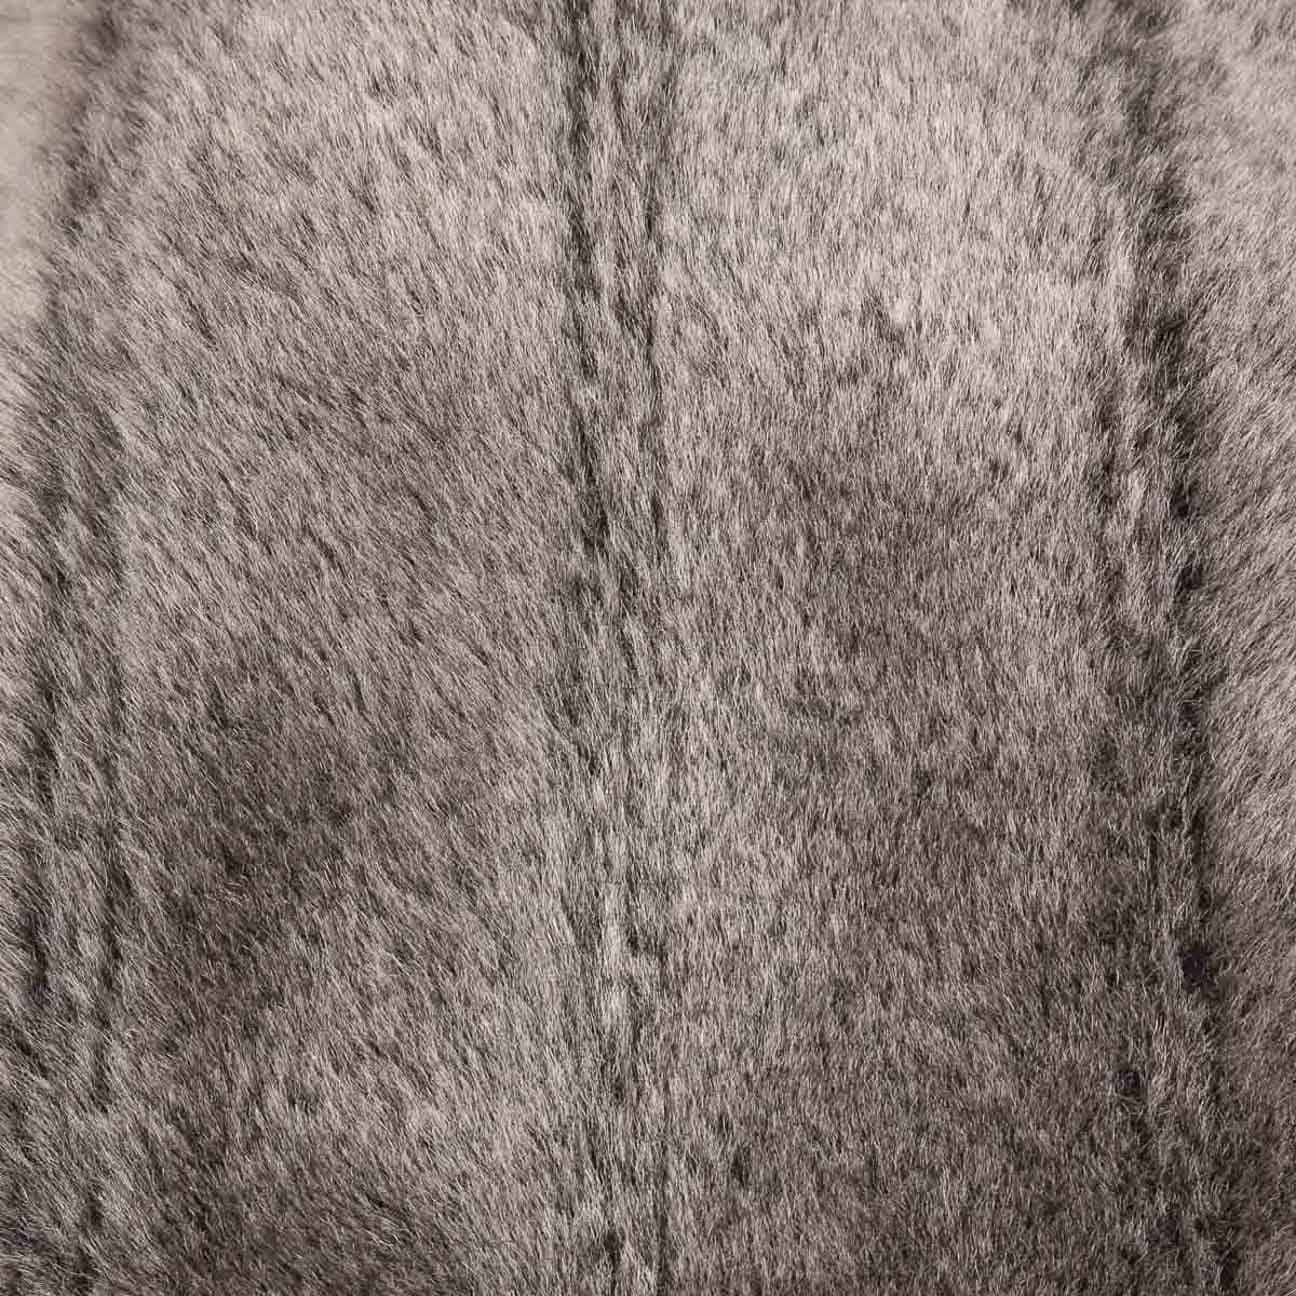 ... Madison Lamb Fur Flat Cap by Stetson - brown 4 ... d93fed93ead0